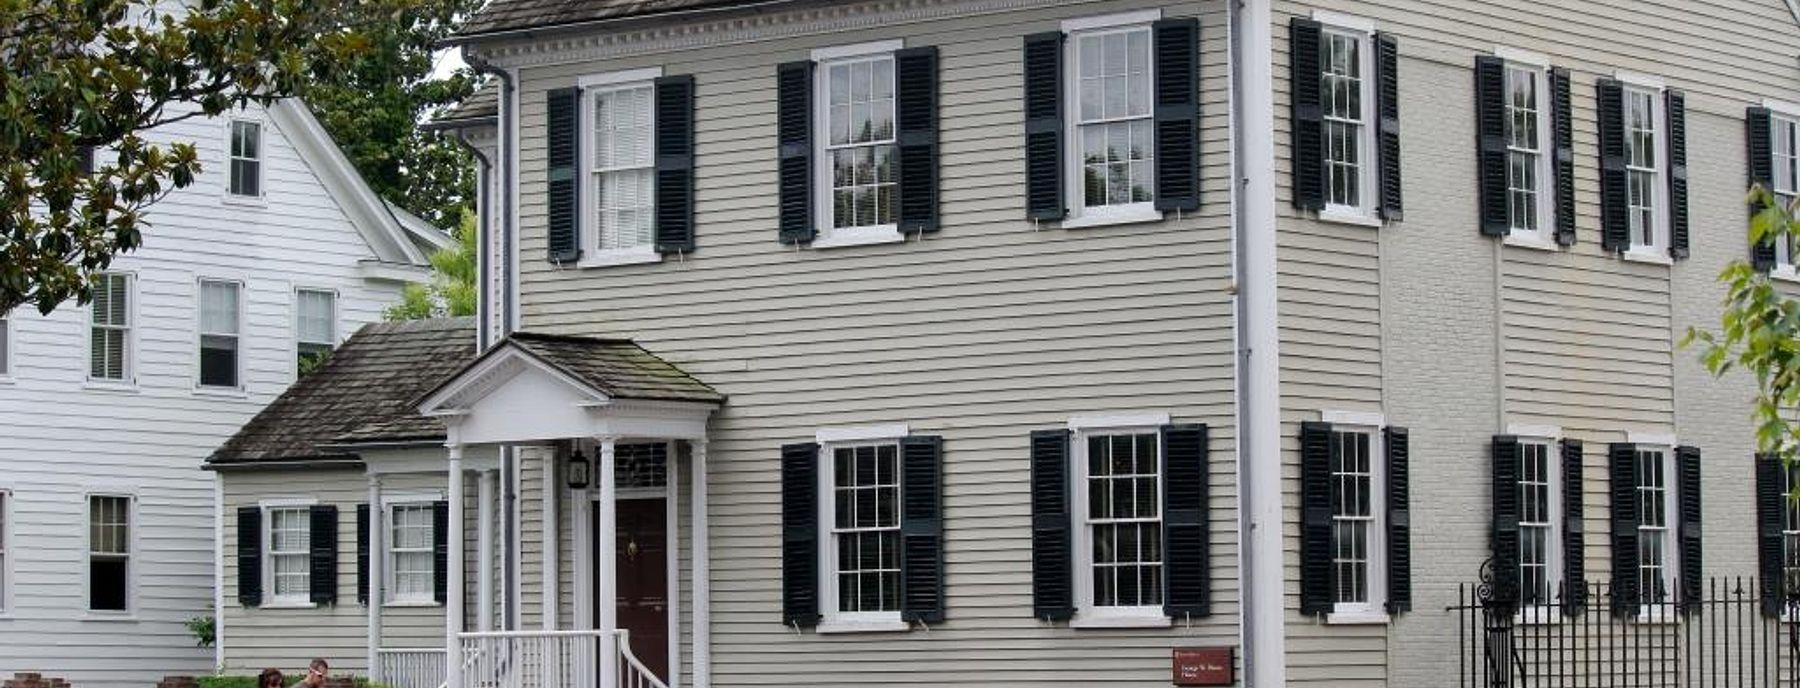 Dixon House off Pollock St.